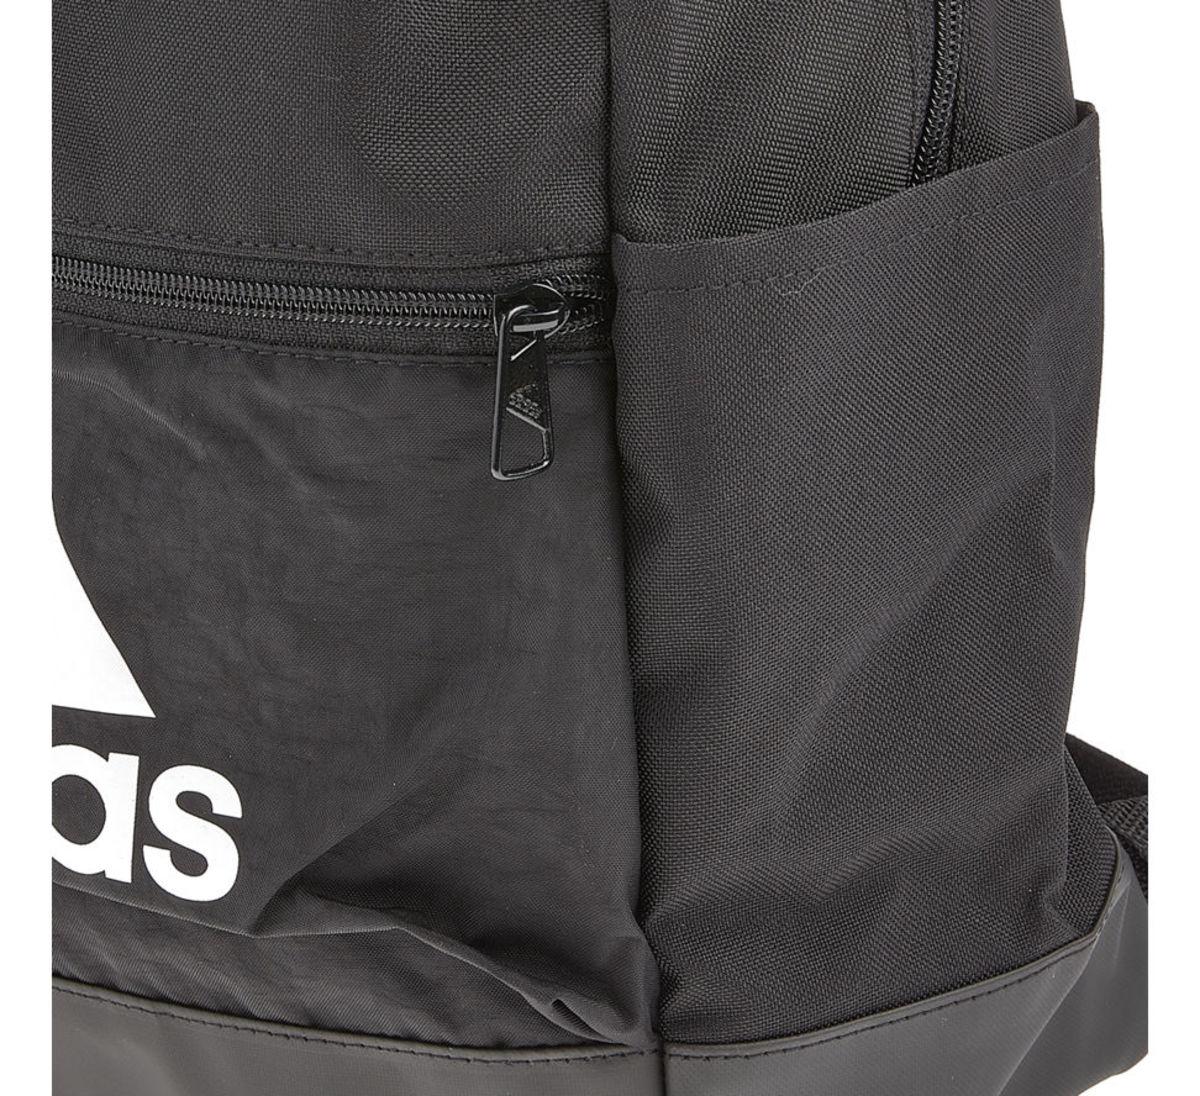 Bild 3 von adidas Rucksack - CLASSIC BP M